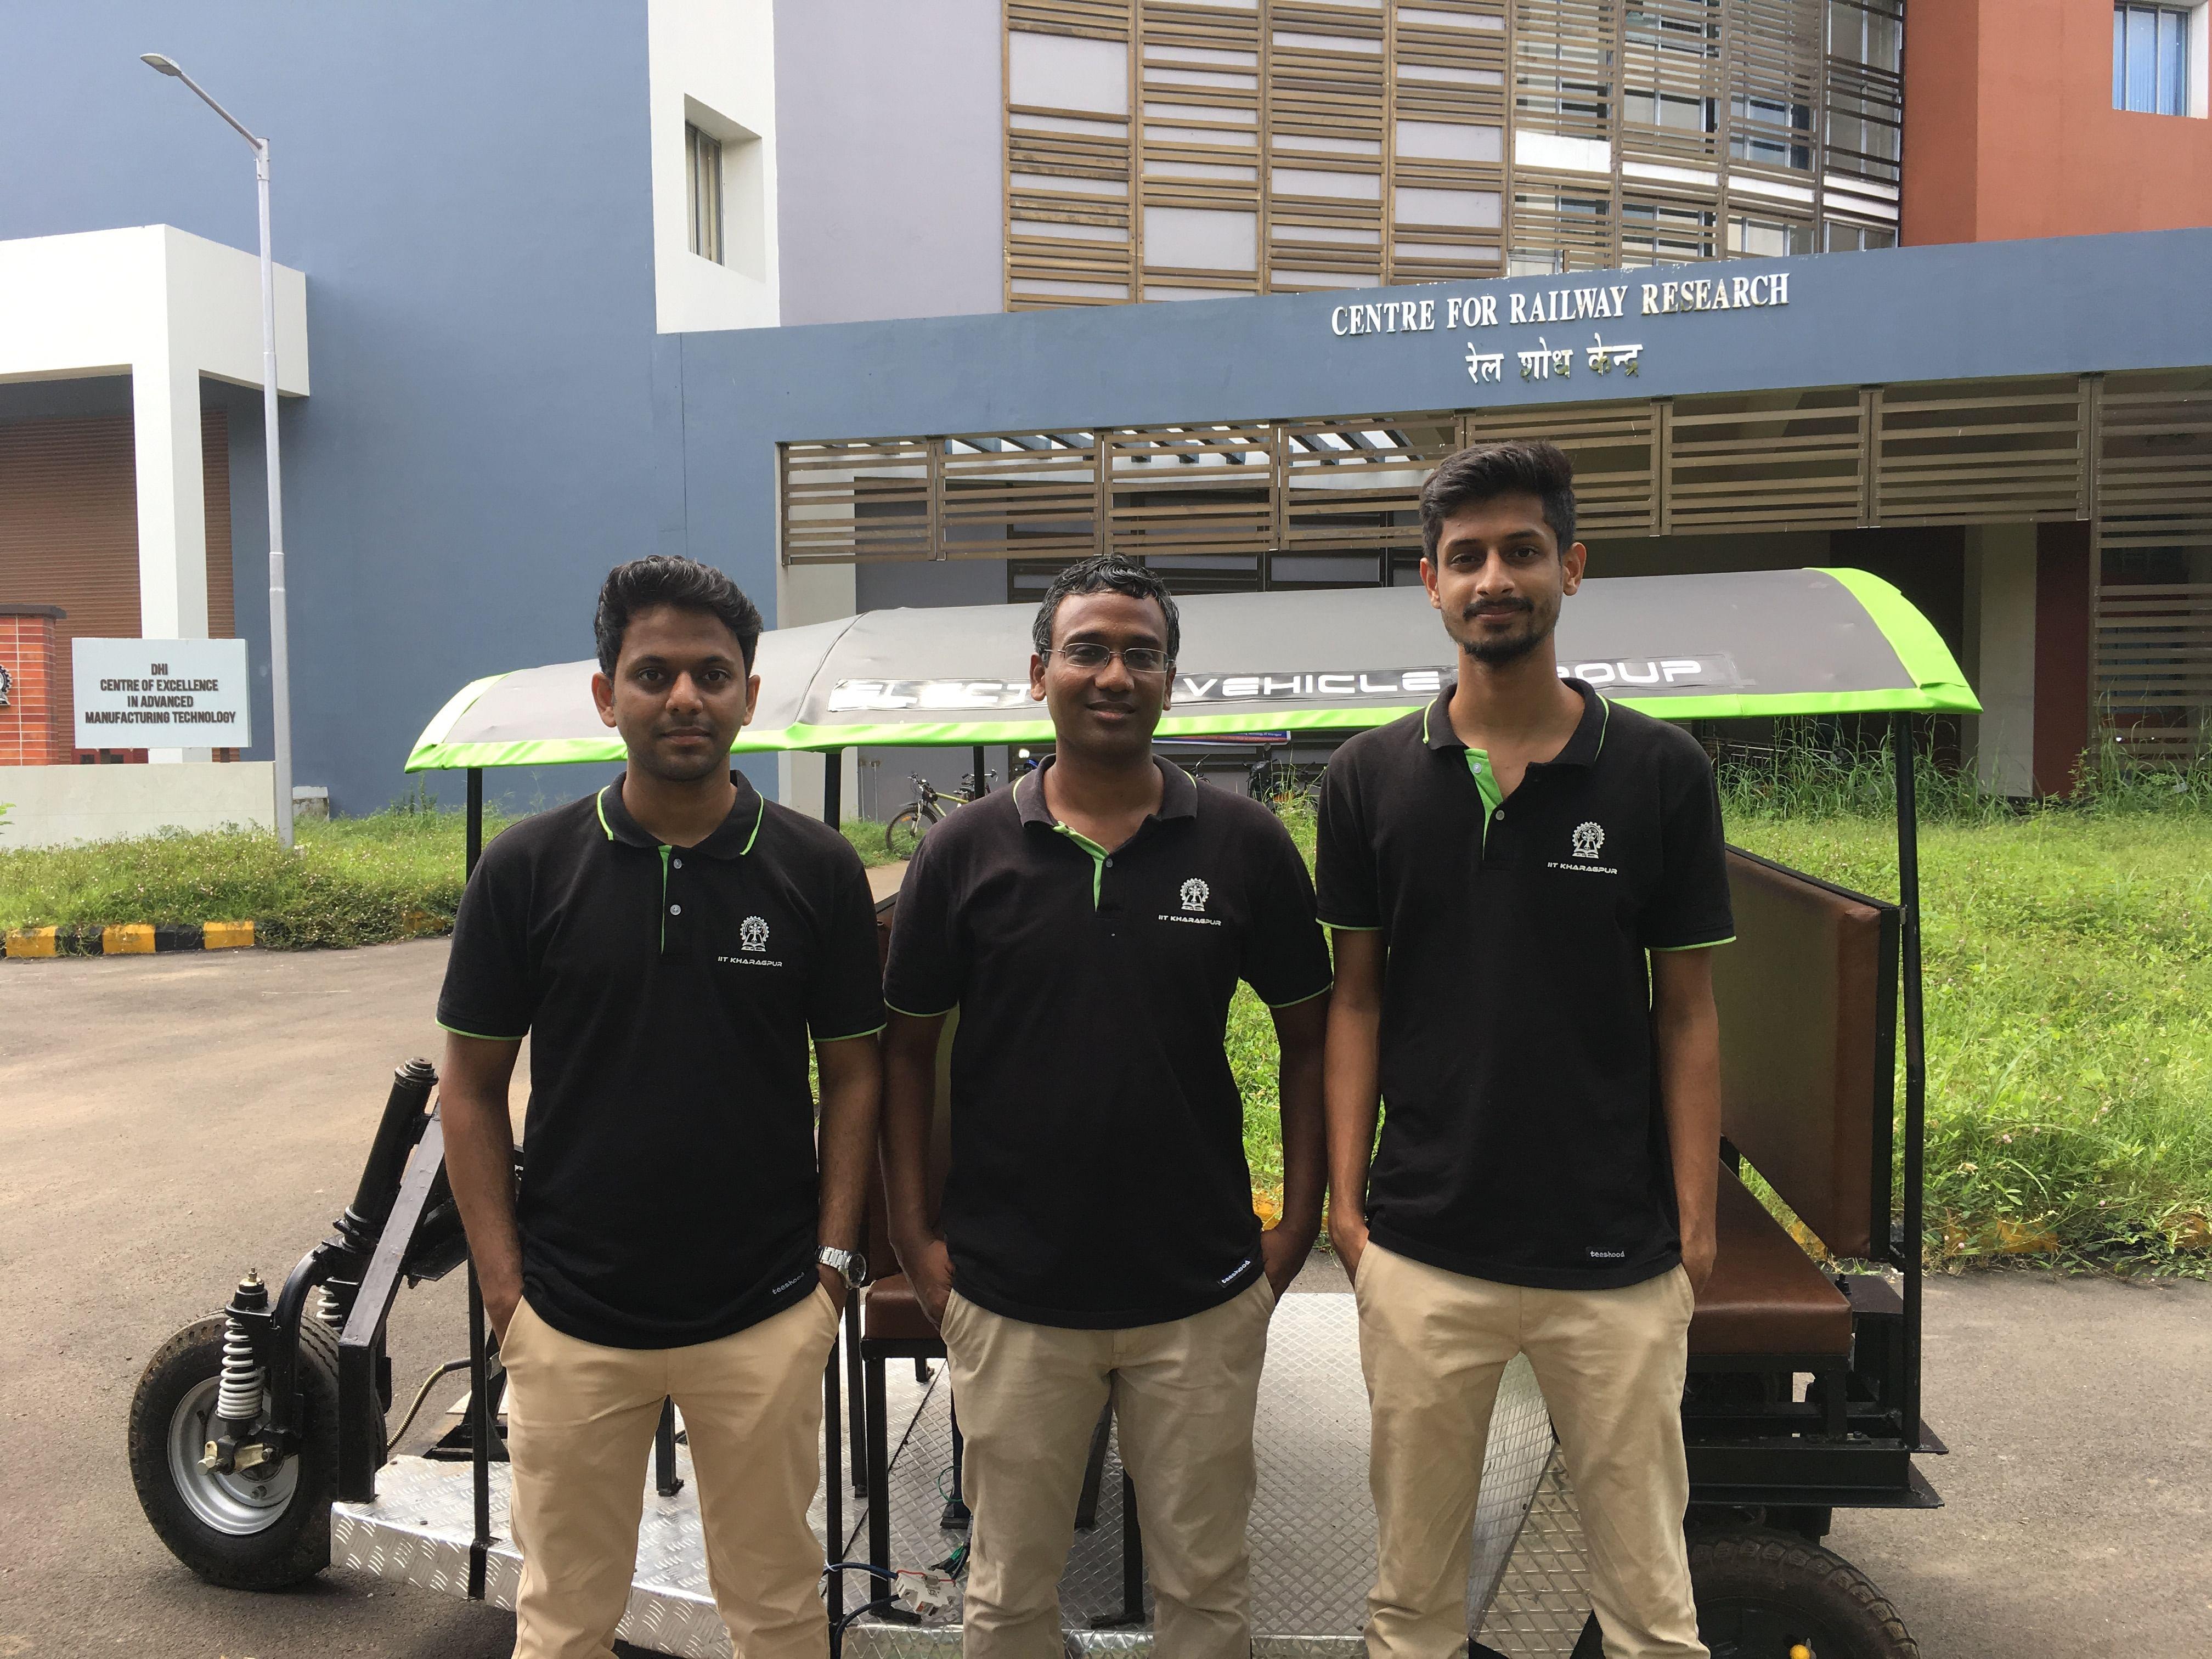 Startup founders (left: Manuj Agrawal, middle: Vikranth Racherla, right: Shyama Agrawal)